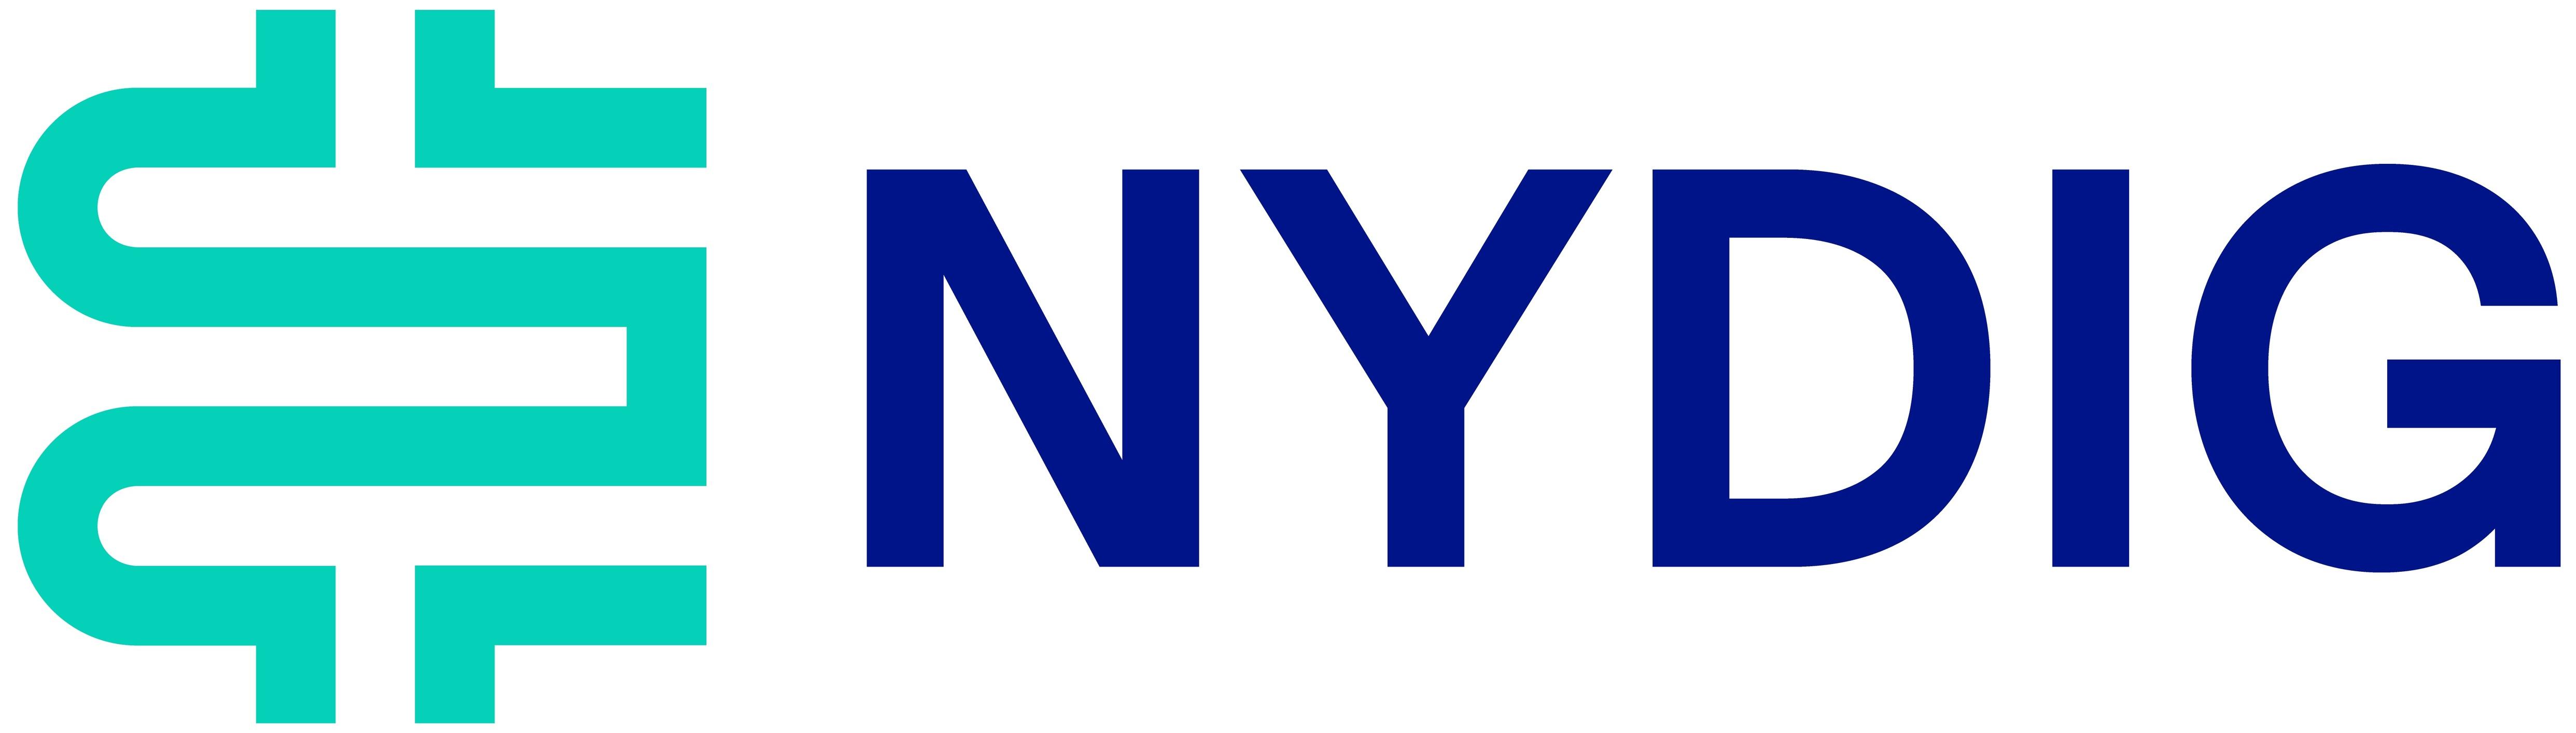 NYDIG Raises $200 Million from Strategic Partners